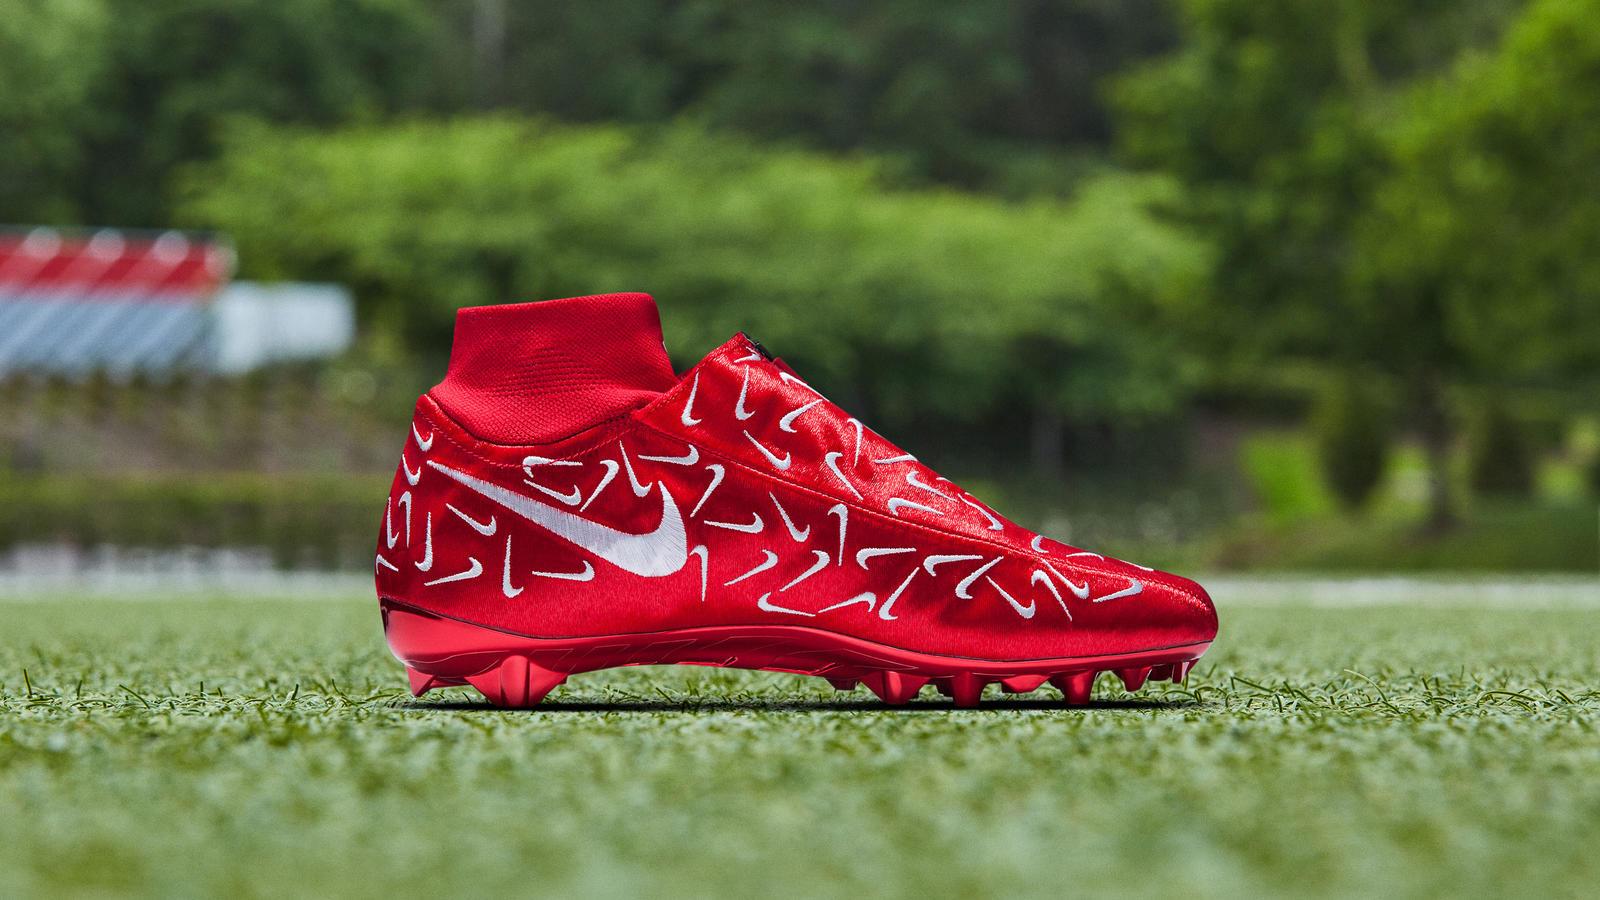 OBJ Will Wear The Ultimate Nike Swoosh Cleat 1